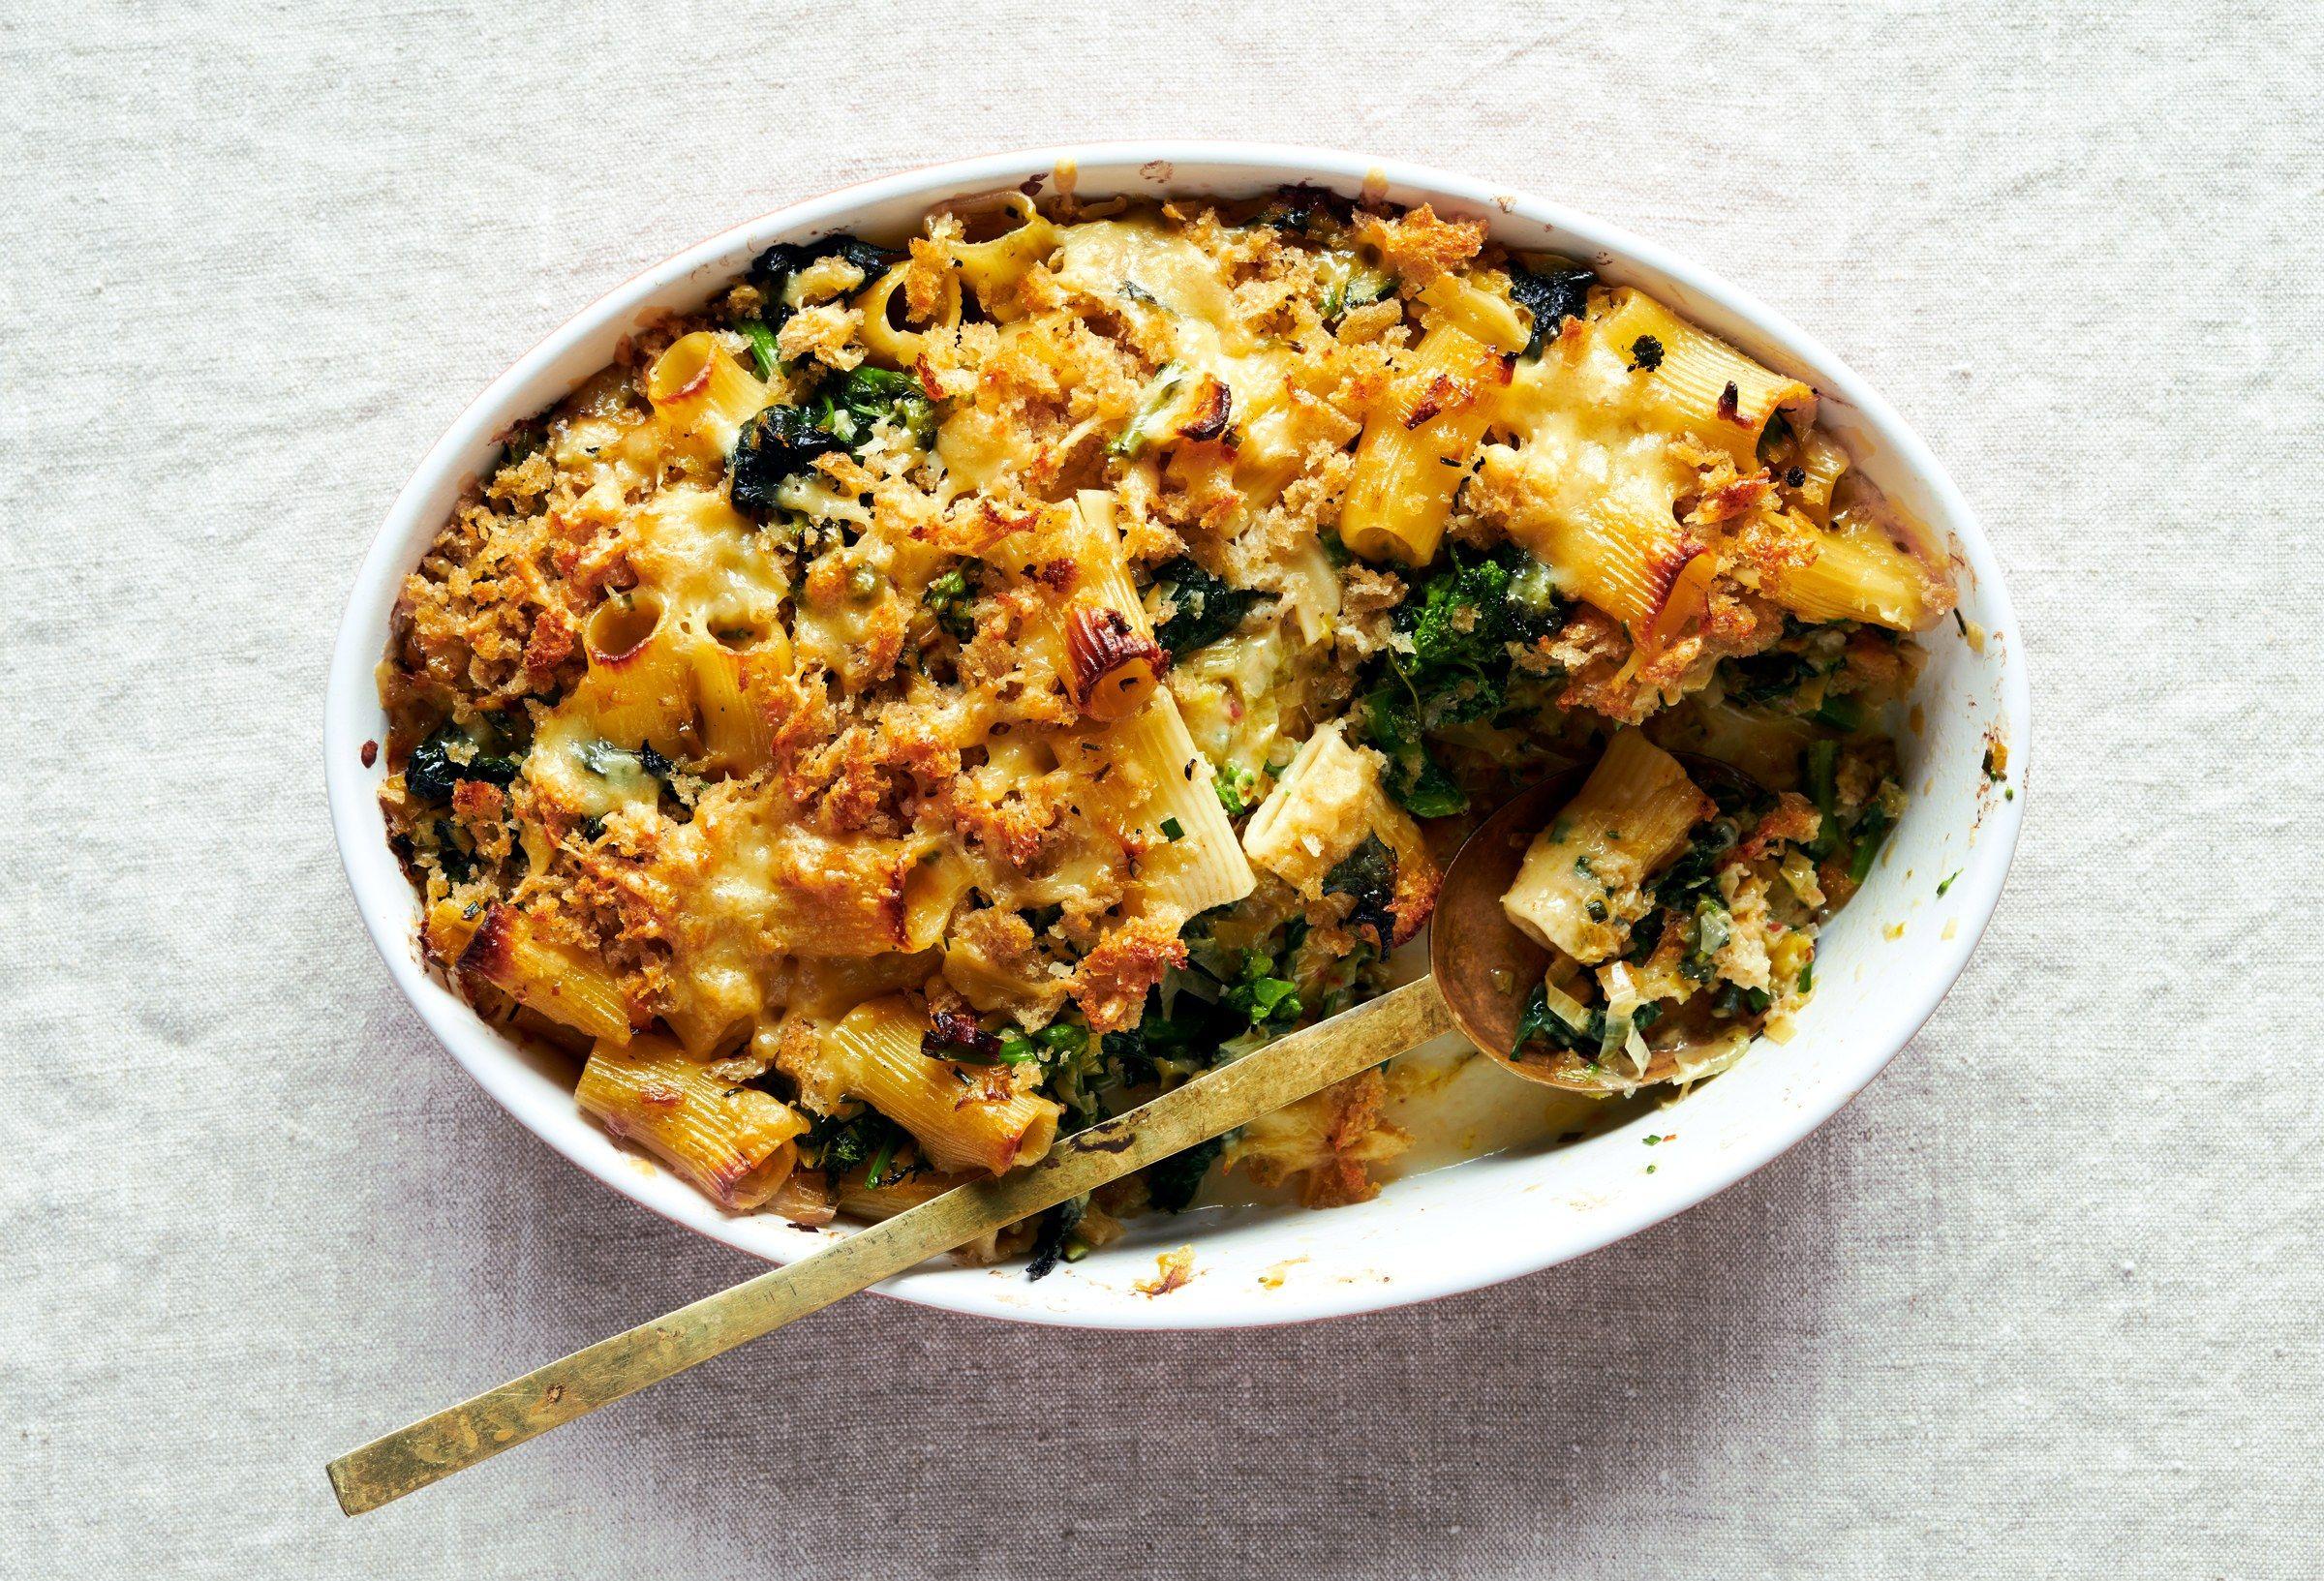 Spicy Baked Pasta Recipe In 2020 Pasta Bake Pasta Recipes